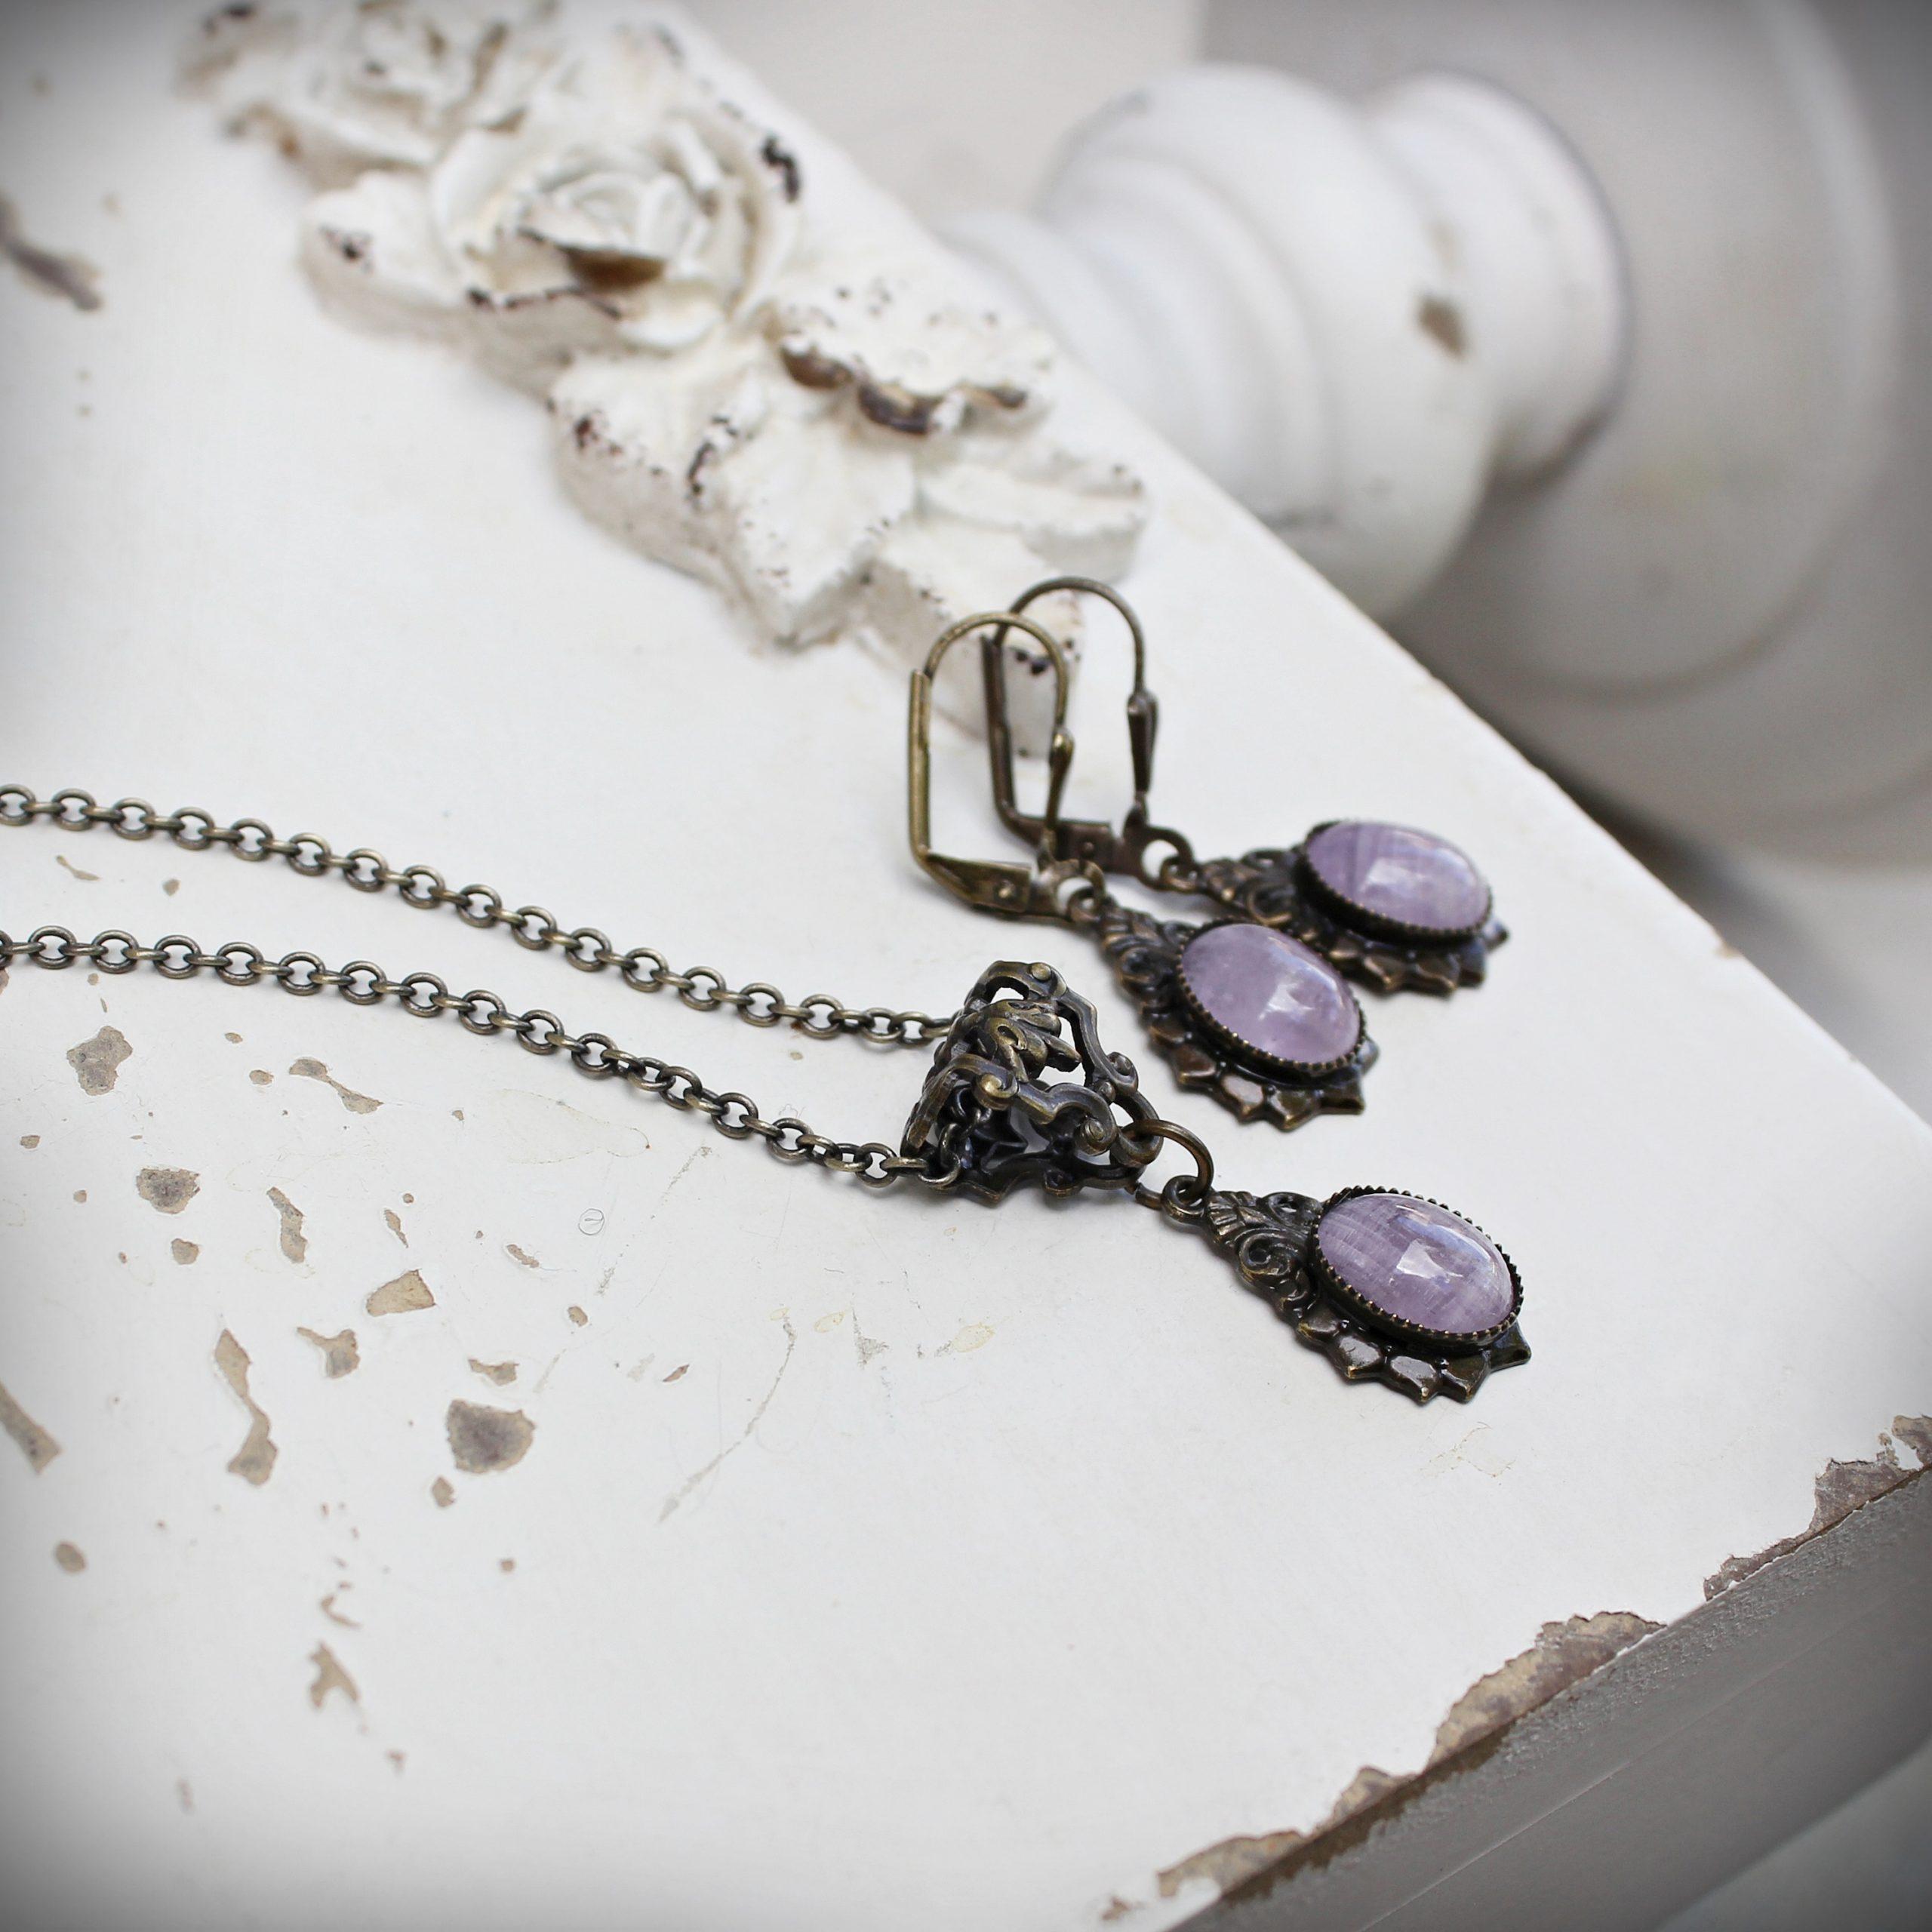 amethyst necklace earrings vintage style